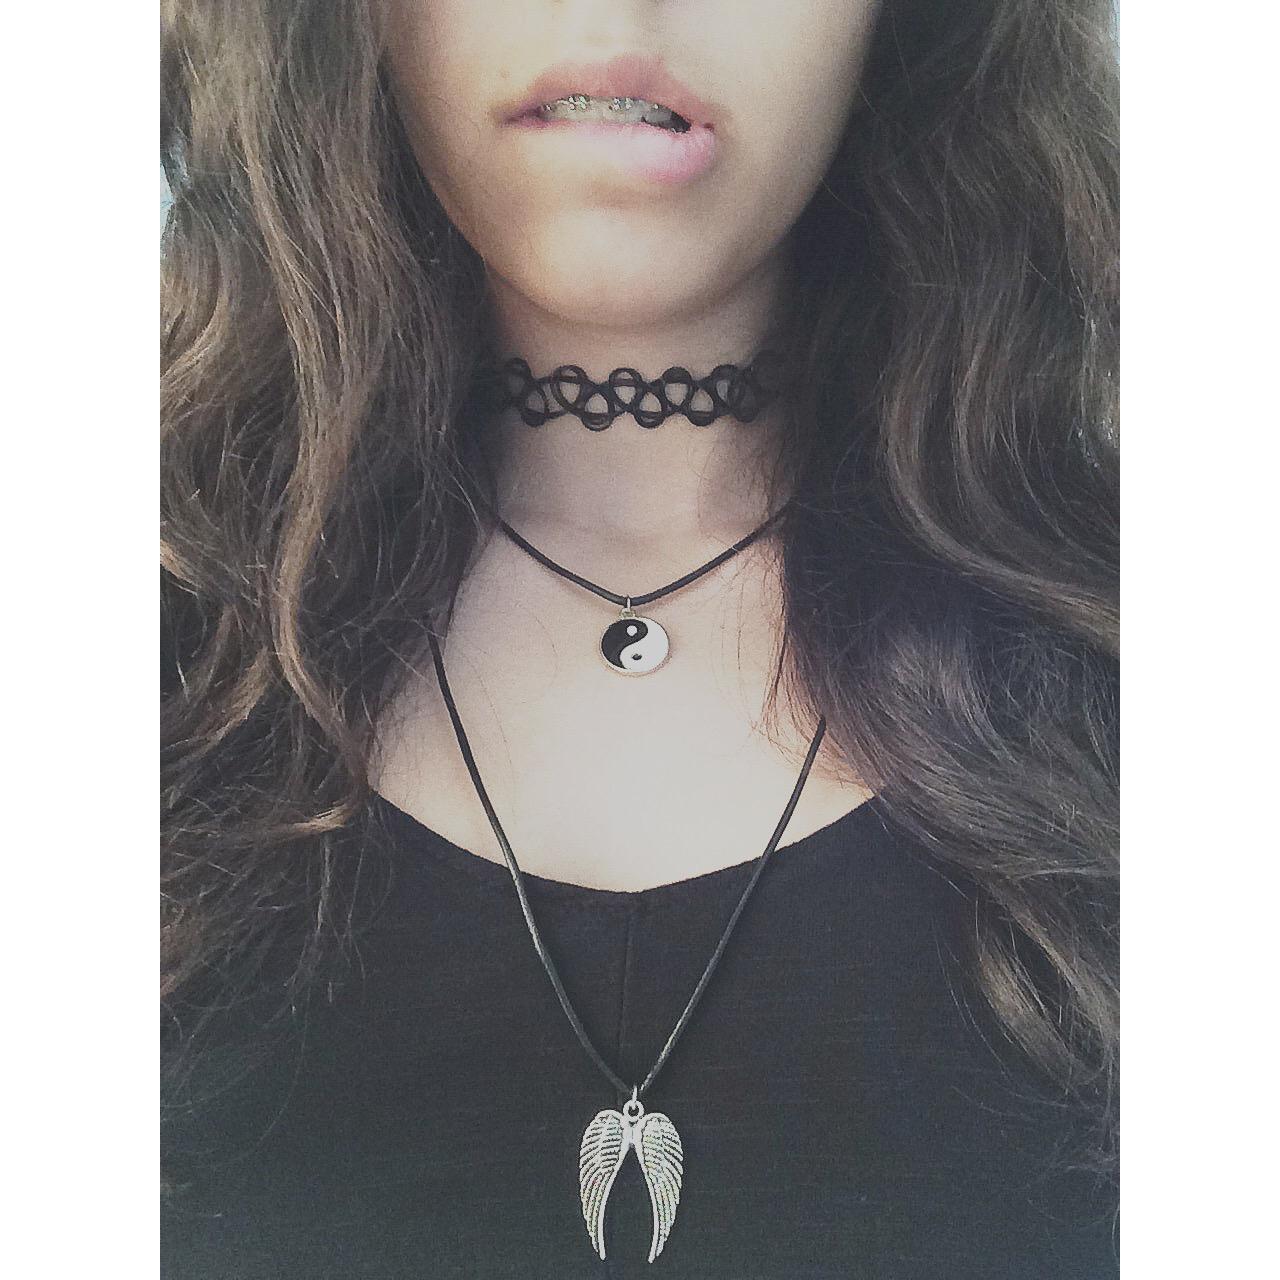 Black Choker Necklace Tumblr